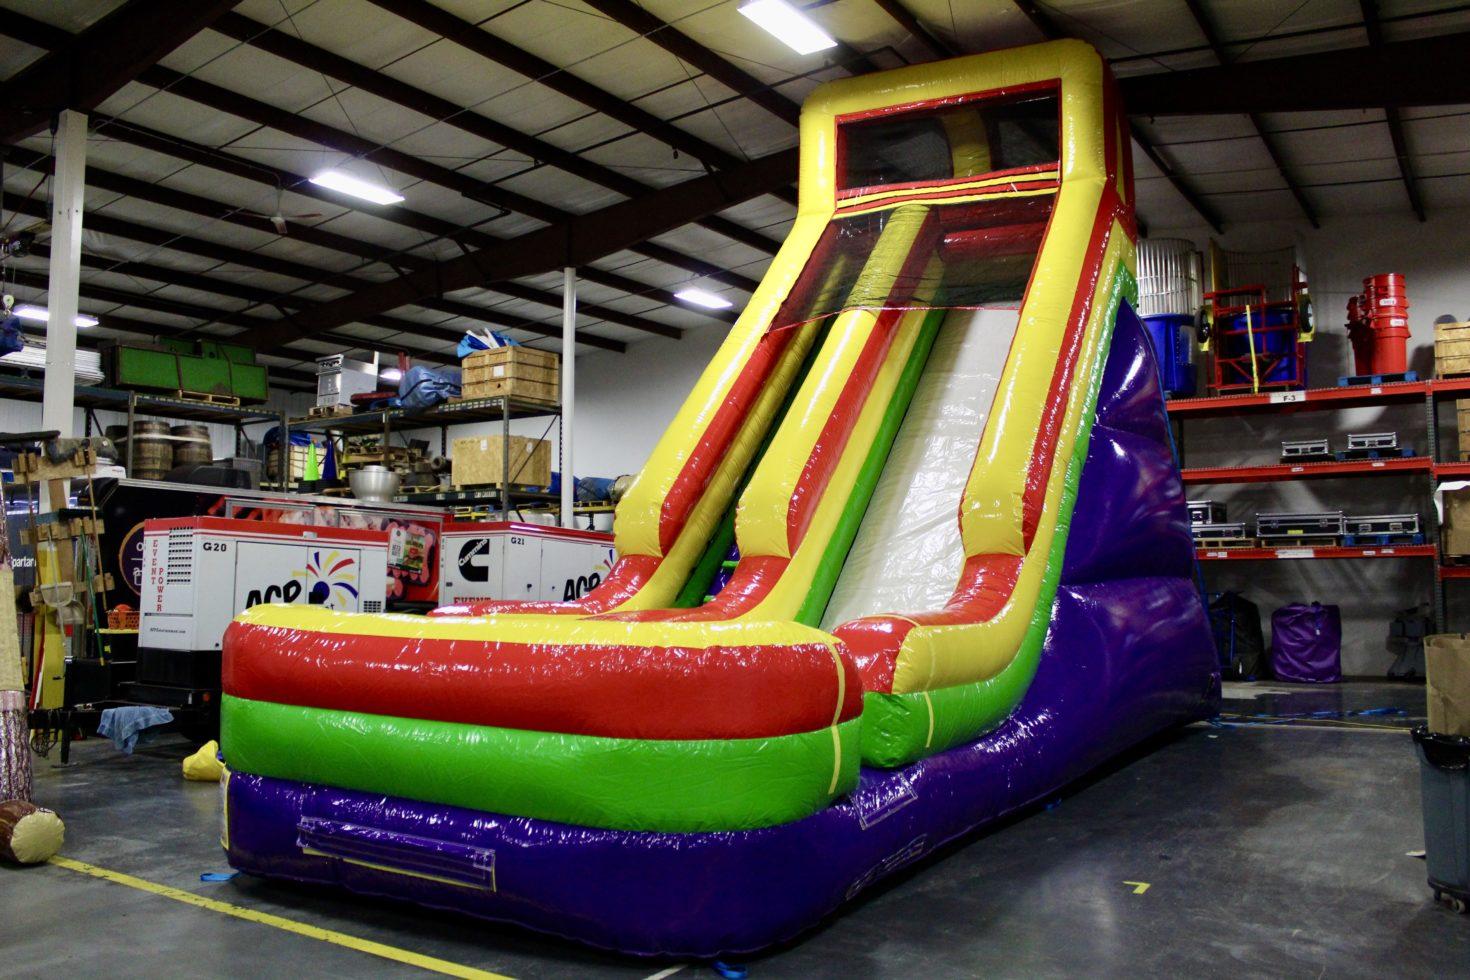 Side angle 24' inflatable commander slide